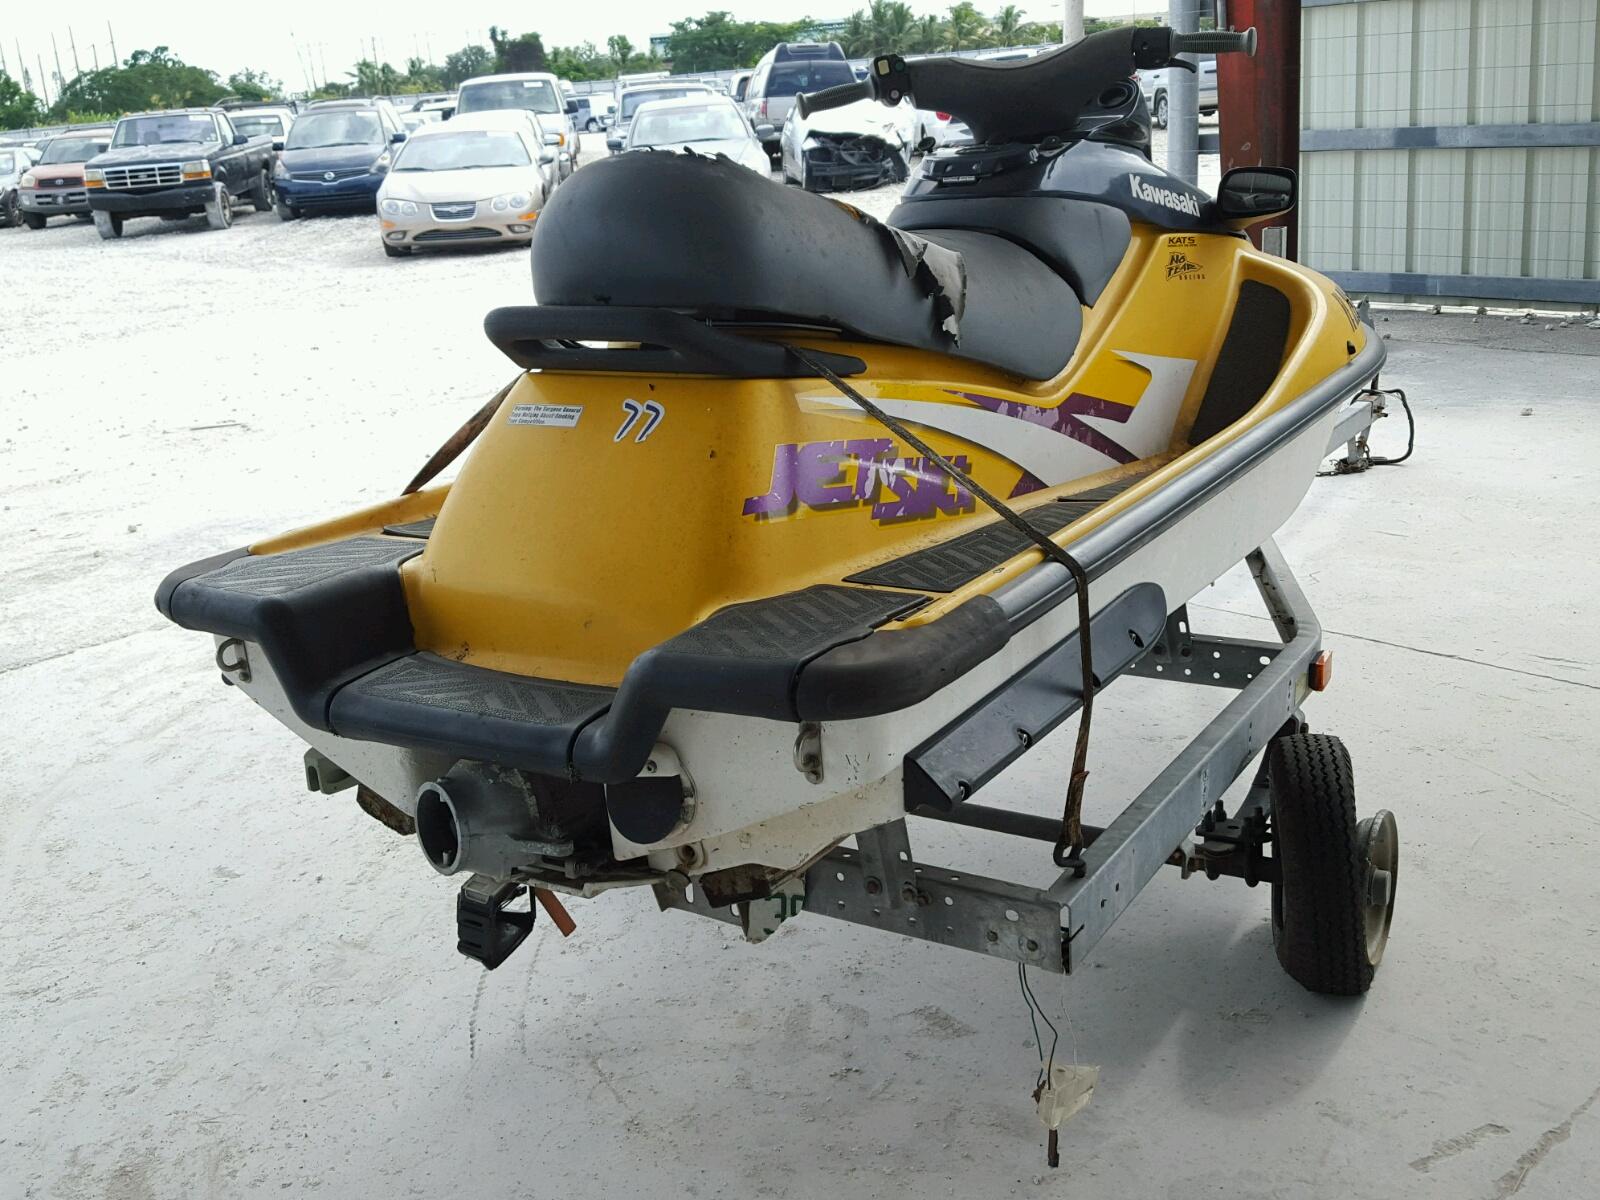 1998 Kawasaki 1100 Zxi in FL - Miami South (KAW002790C898